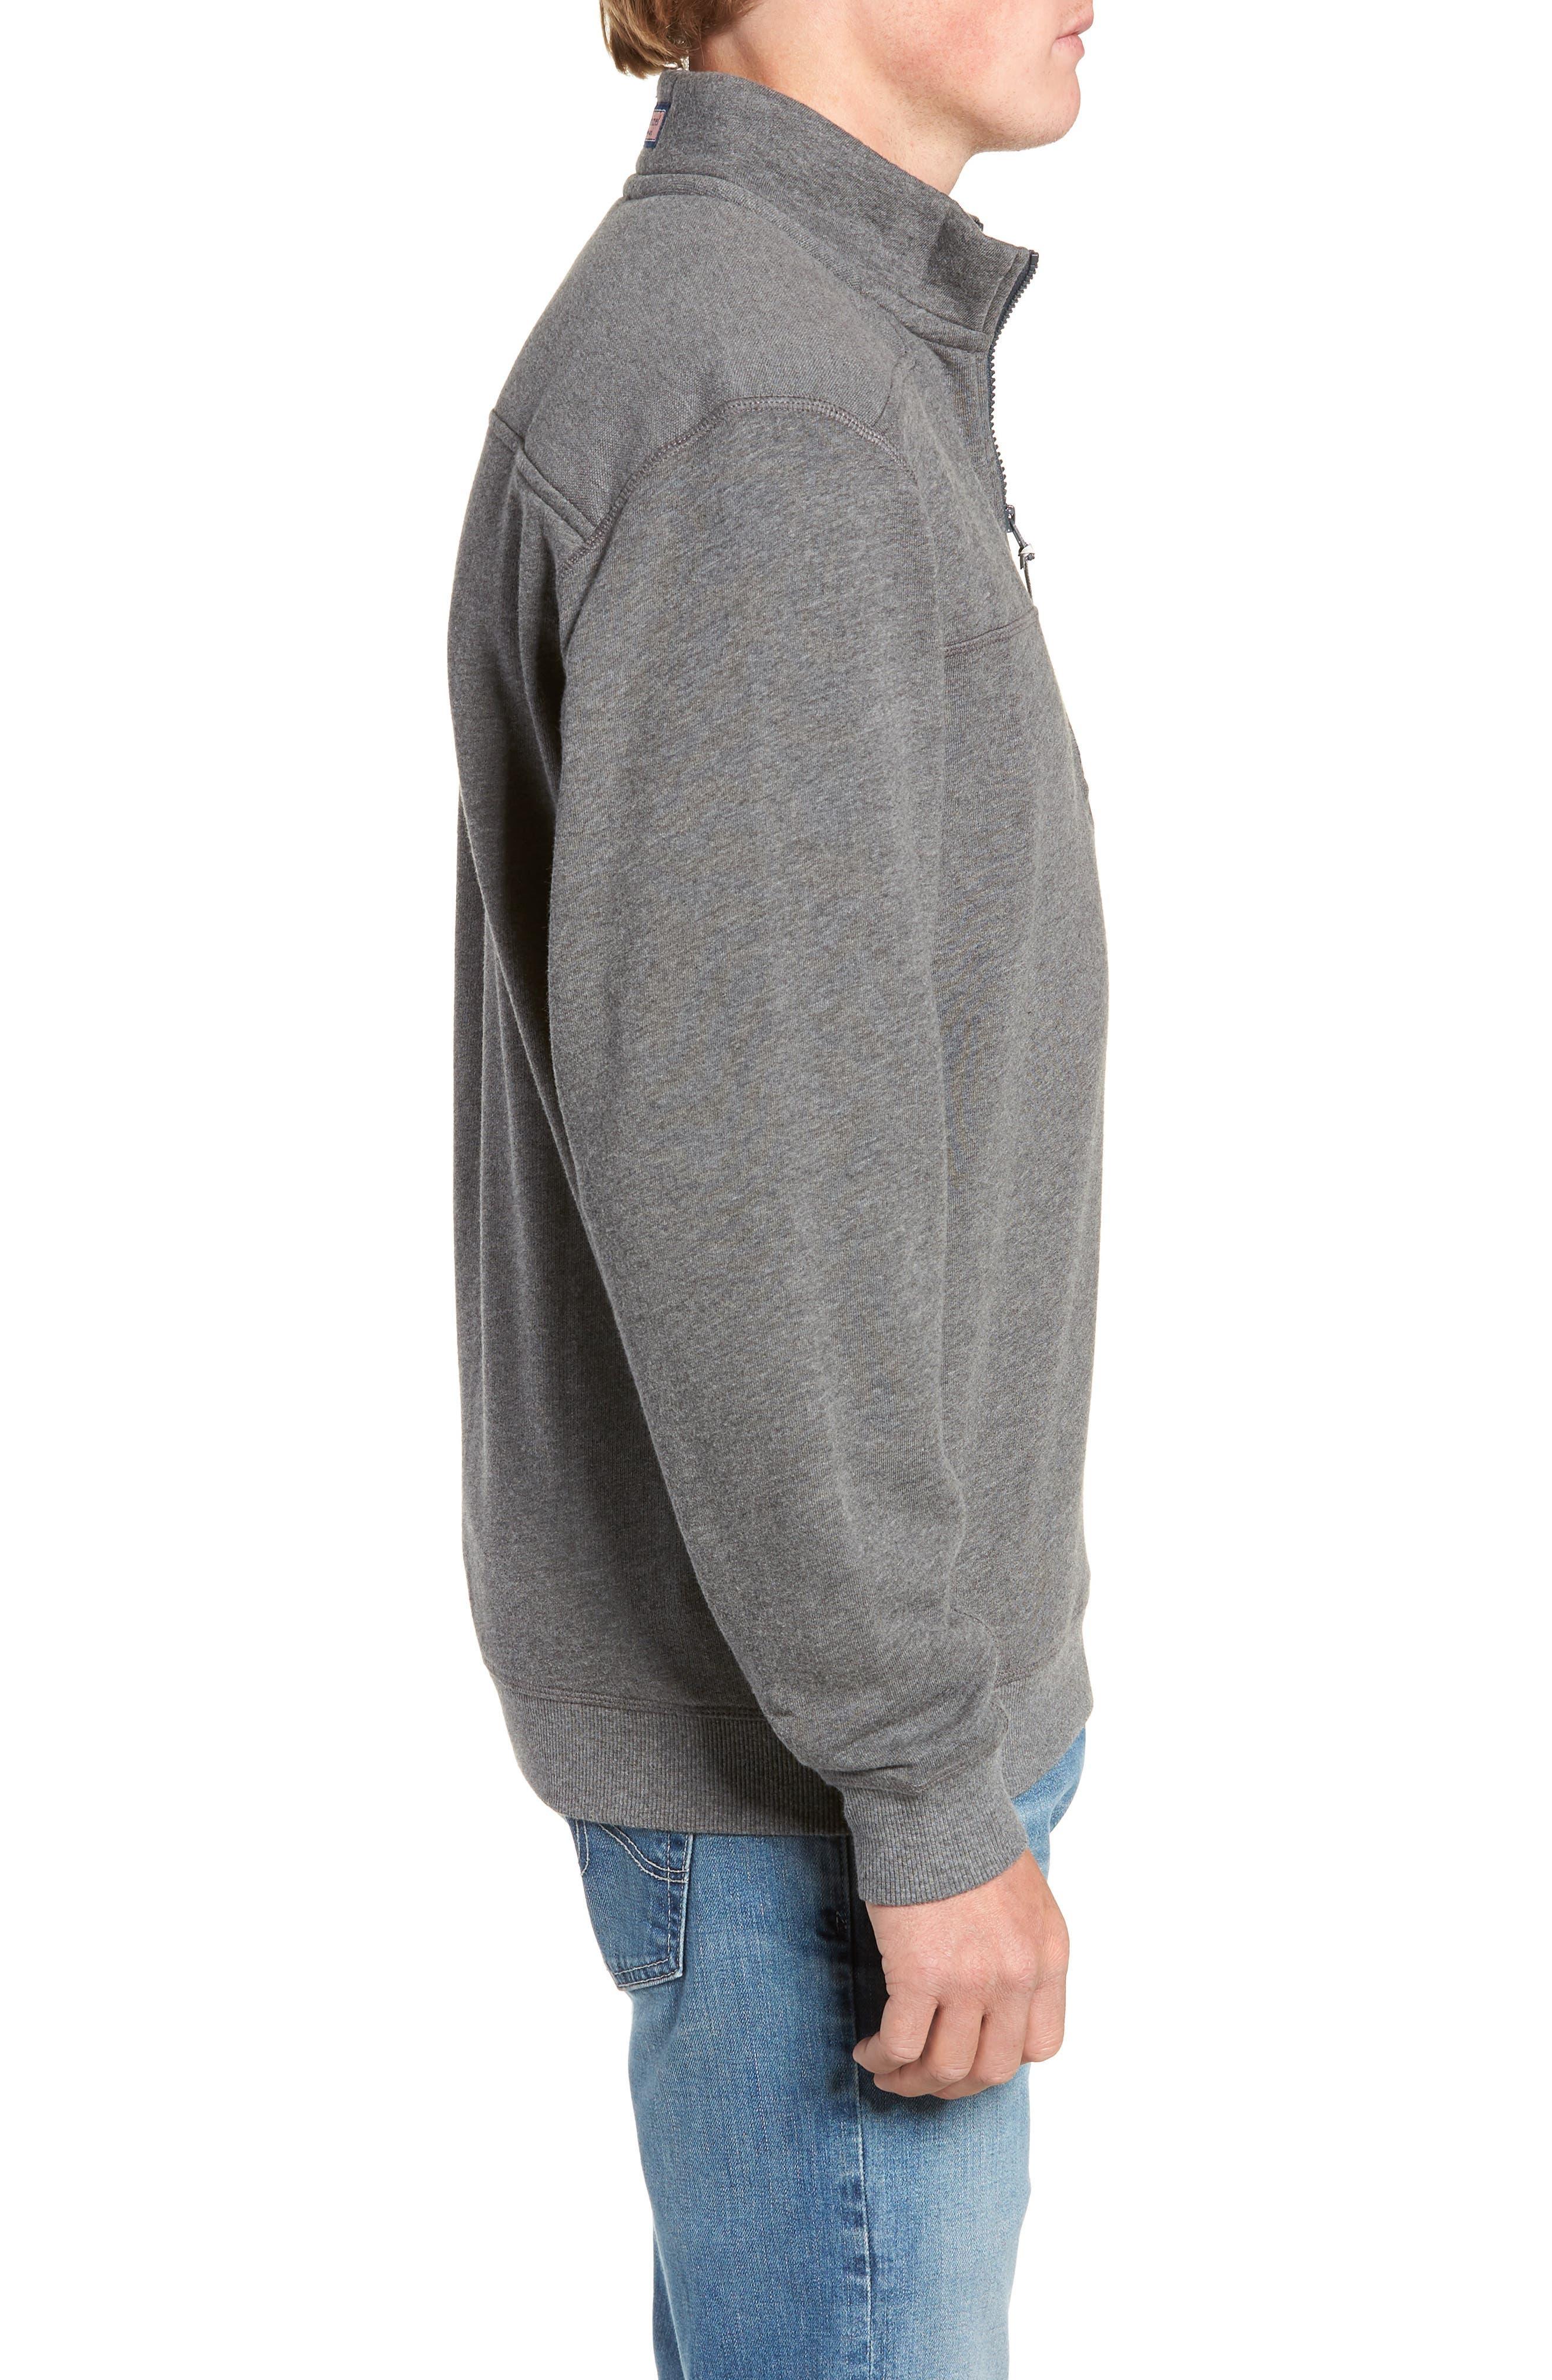 VINEYARD VINES,                             Collegiate Half Zip Pullover,                             Alternate thumbnail 3, color,                             023